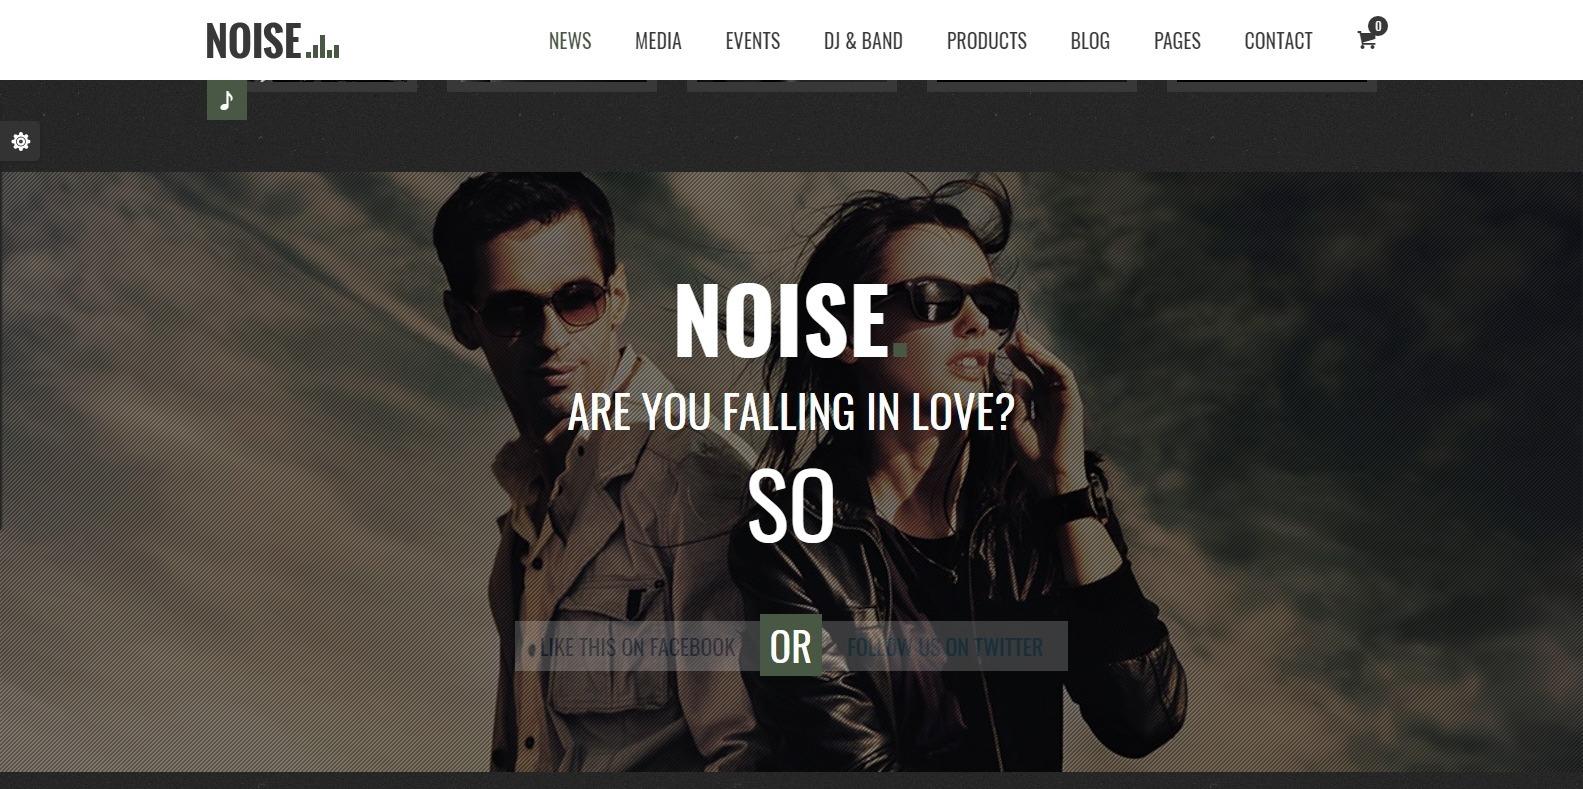 noise-dj-website-template